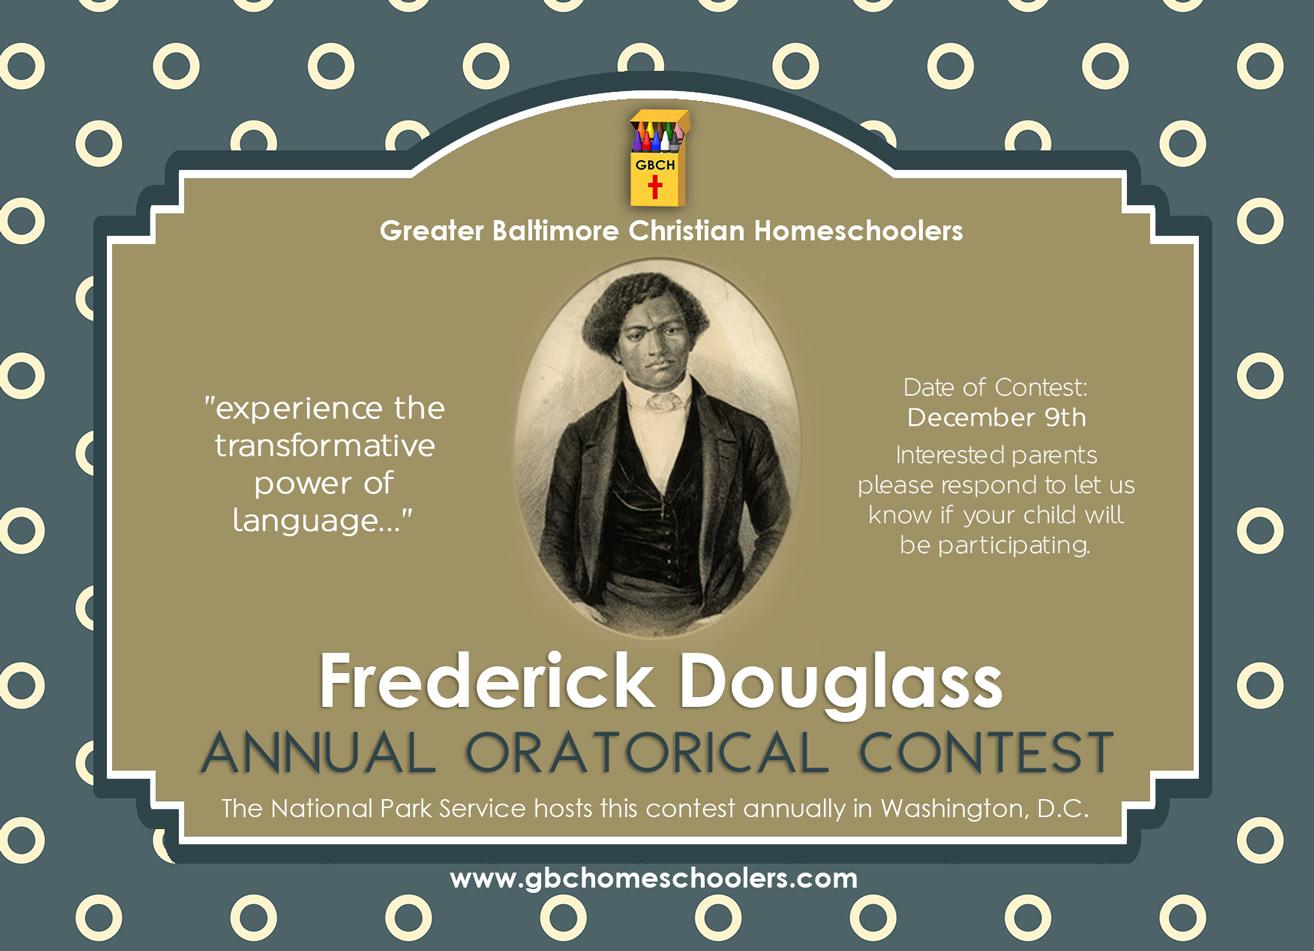 frederick-douglas-oratorical-contest